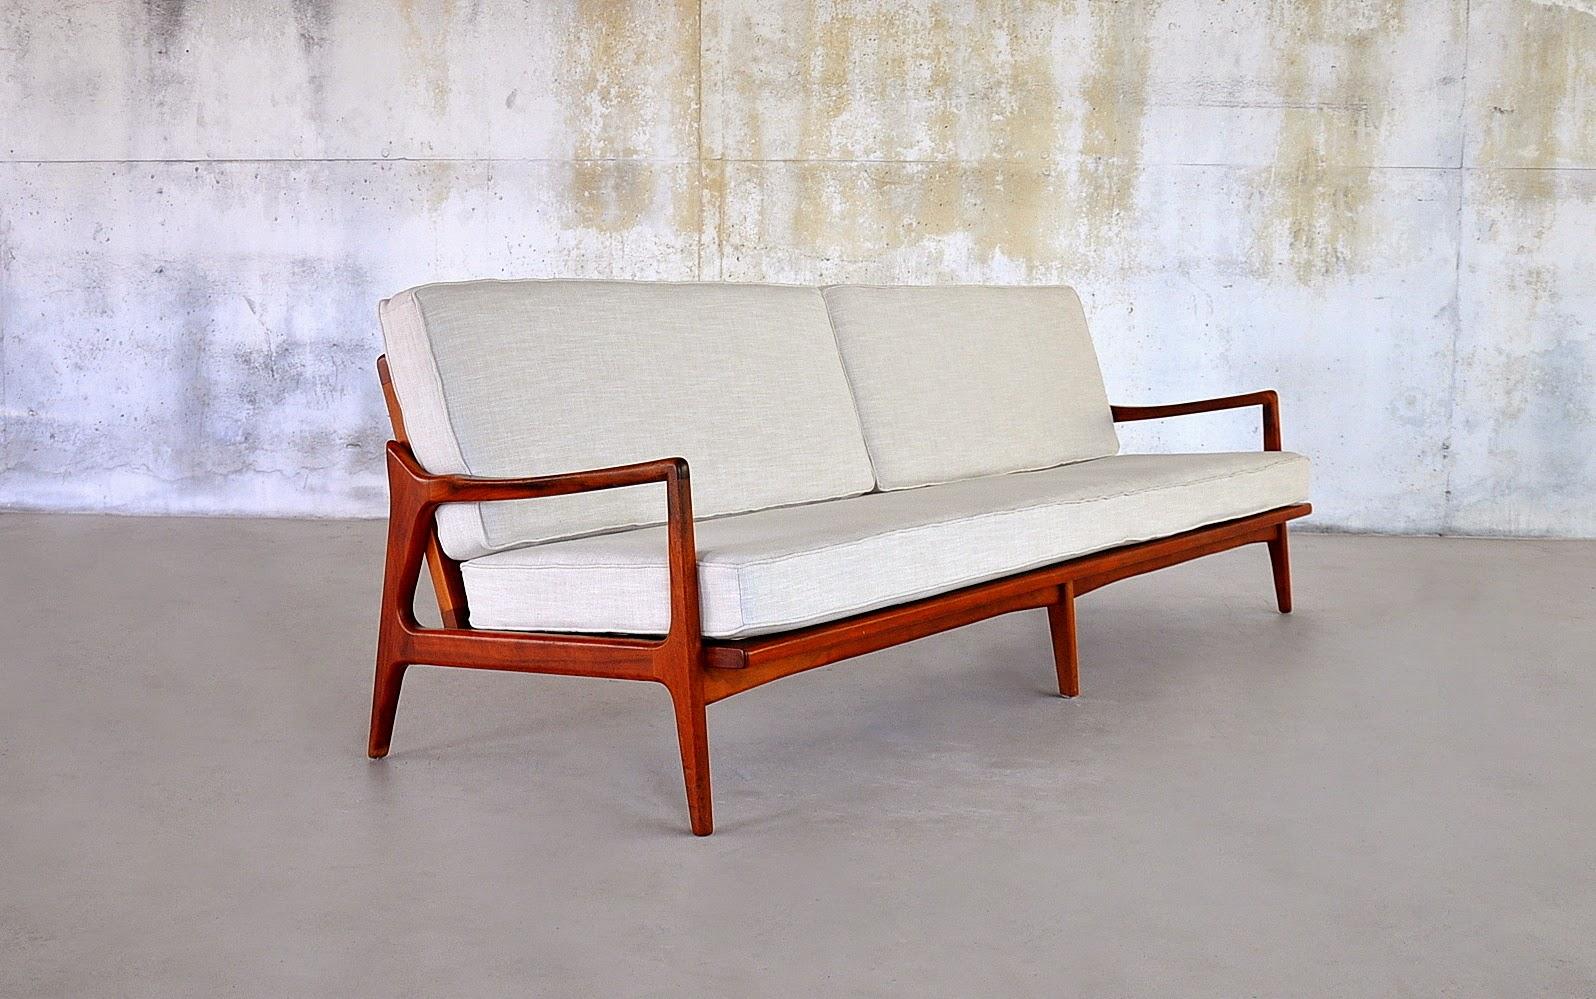 Delicieux Danish Modern Teak 4 Seater Sofa